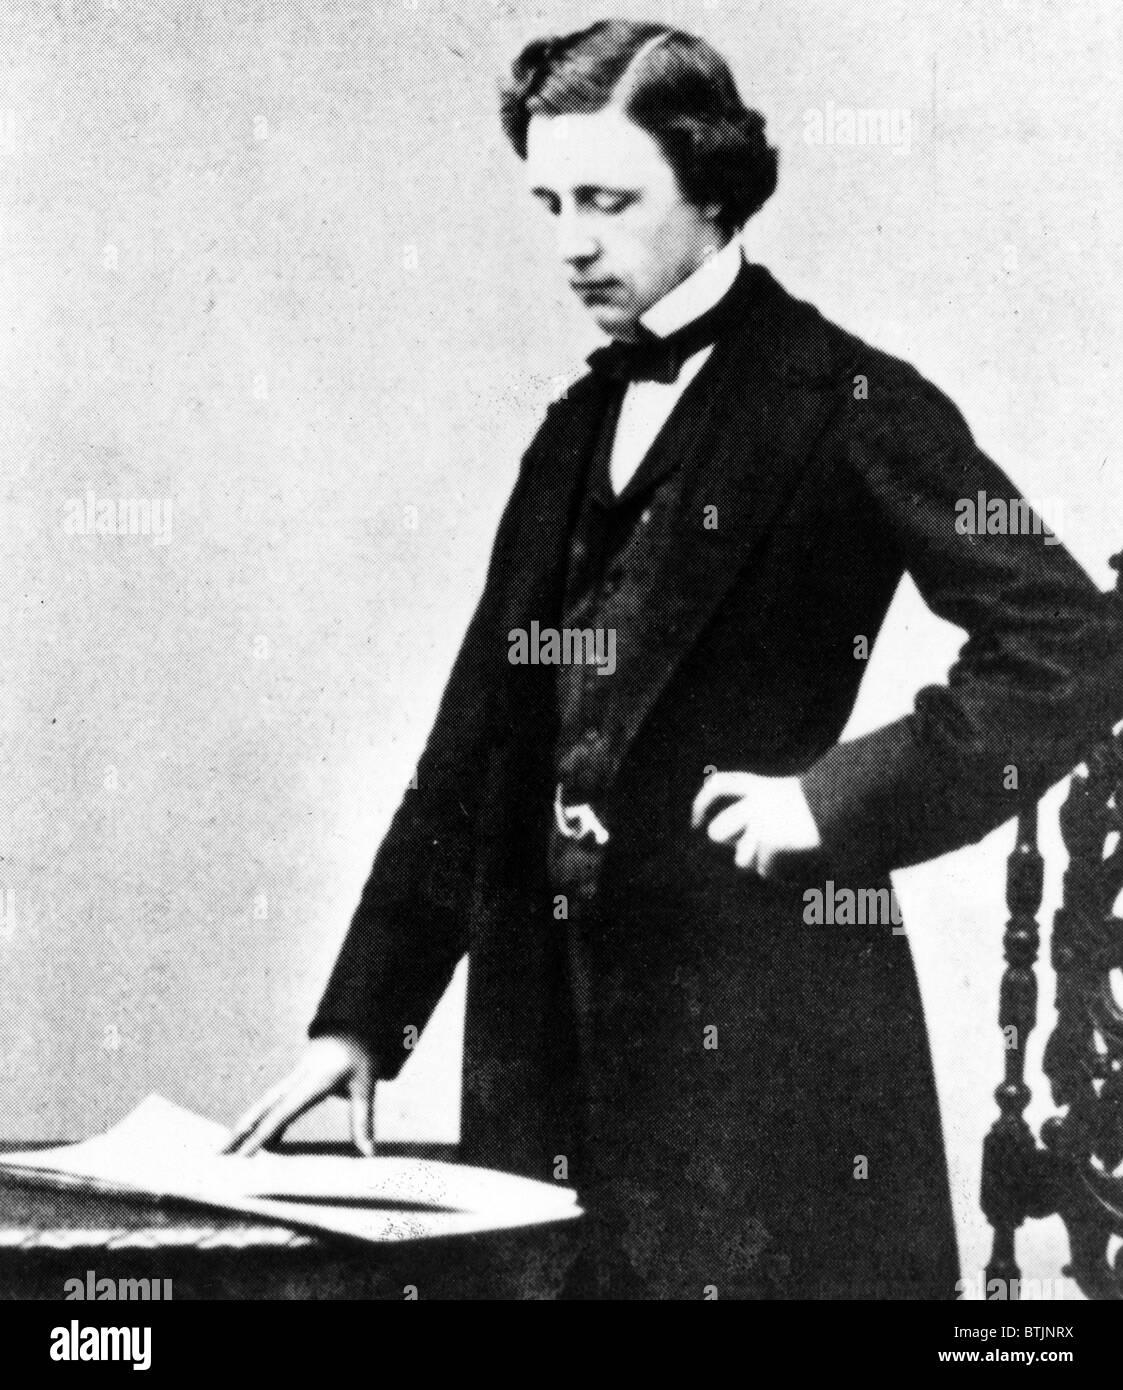 LEWIS CARROLL, (Charles Lutwidge Dogson) at 25. Author of Alice Wonderland, 1857 - Stock Image